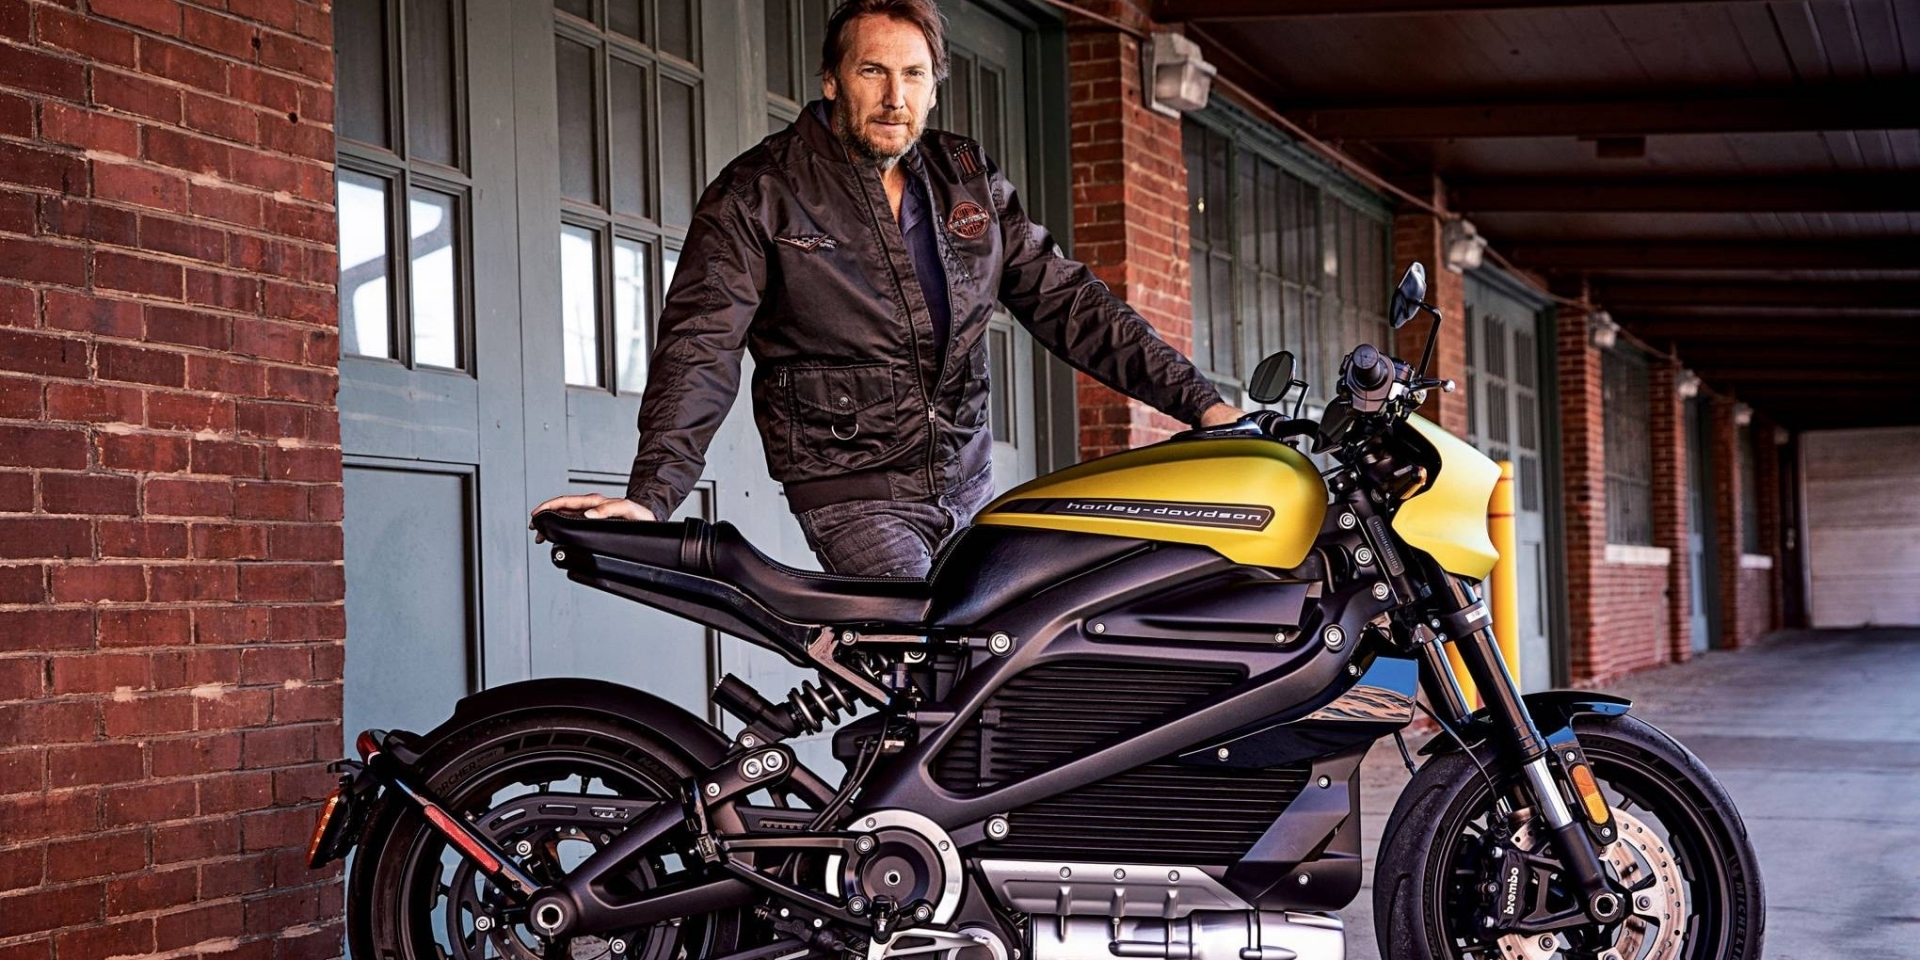 無聲哈雷。LiveWire將成為Harley-Davidson電動機車獨立品牌